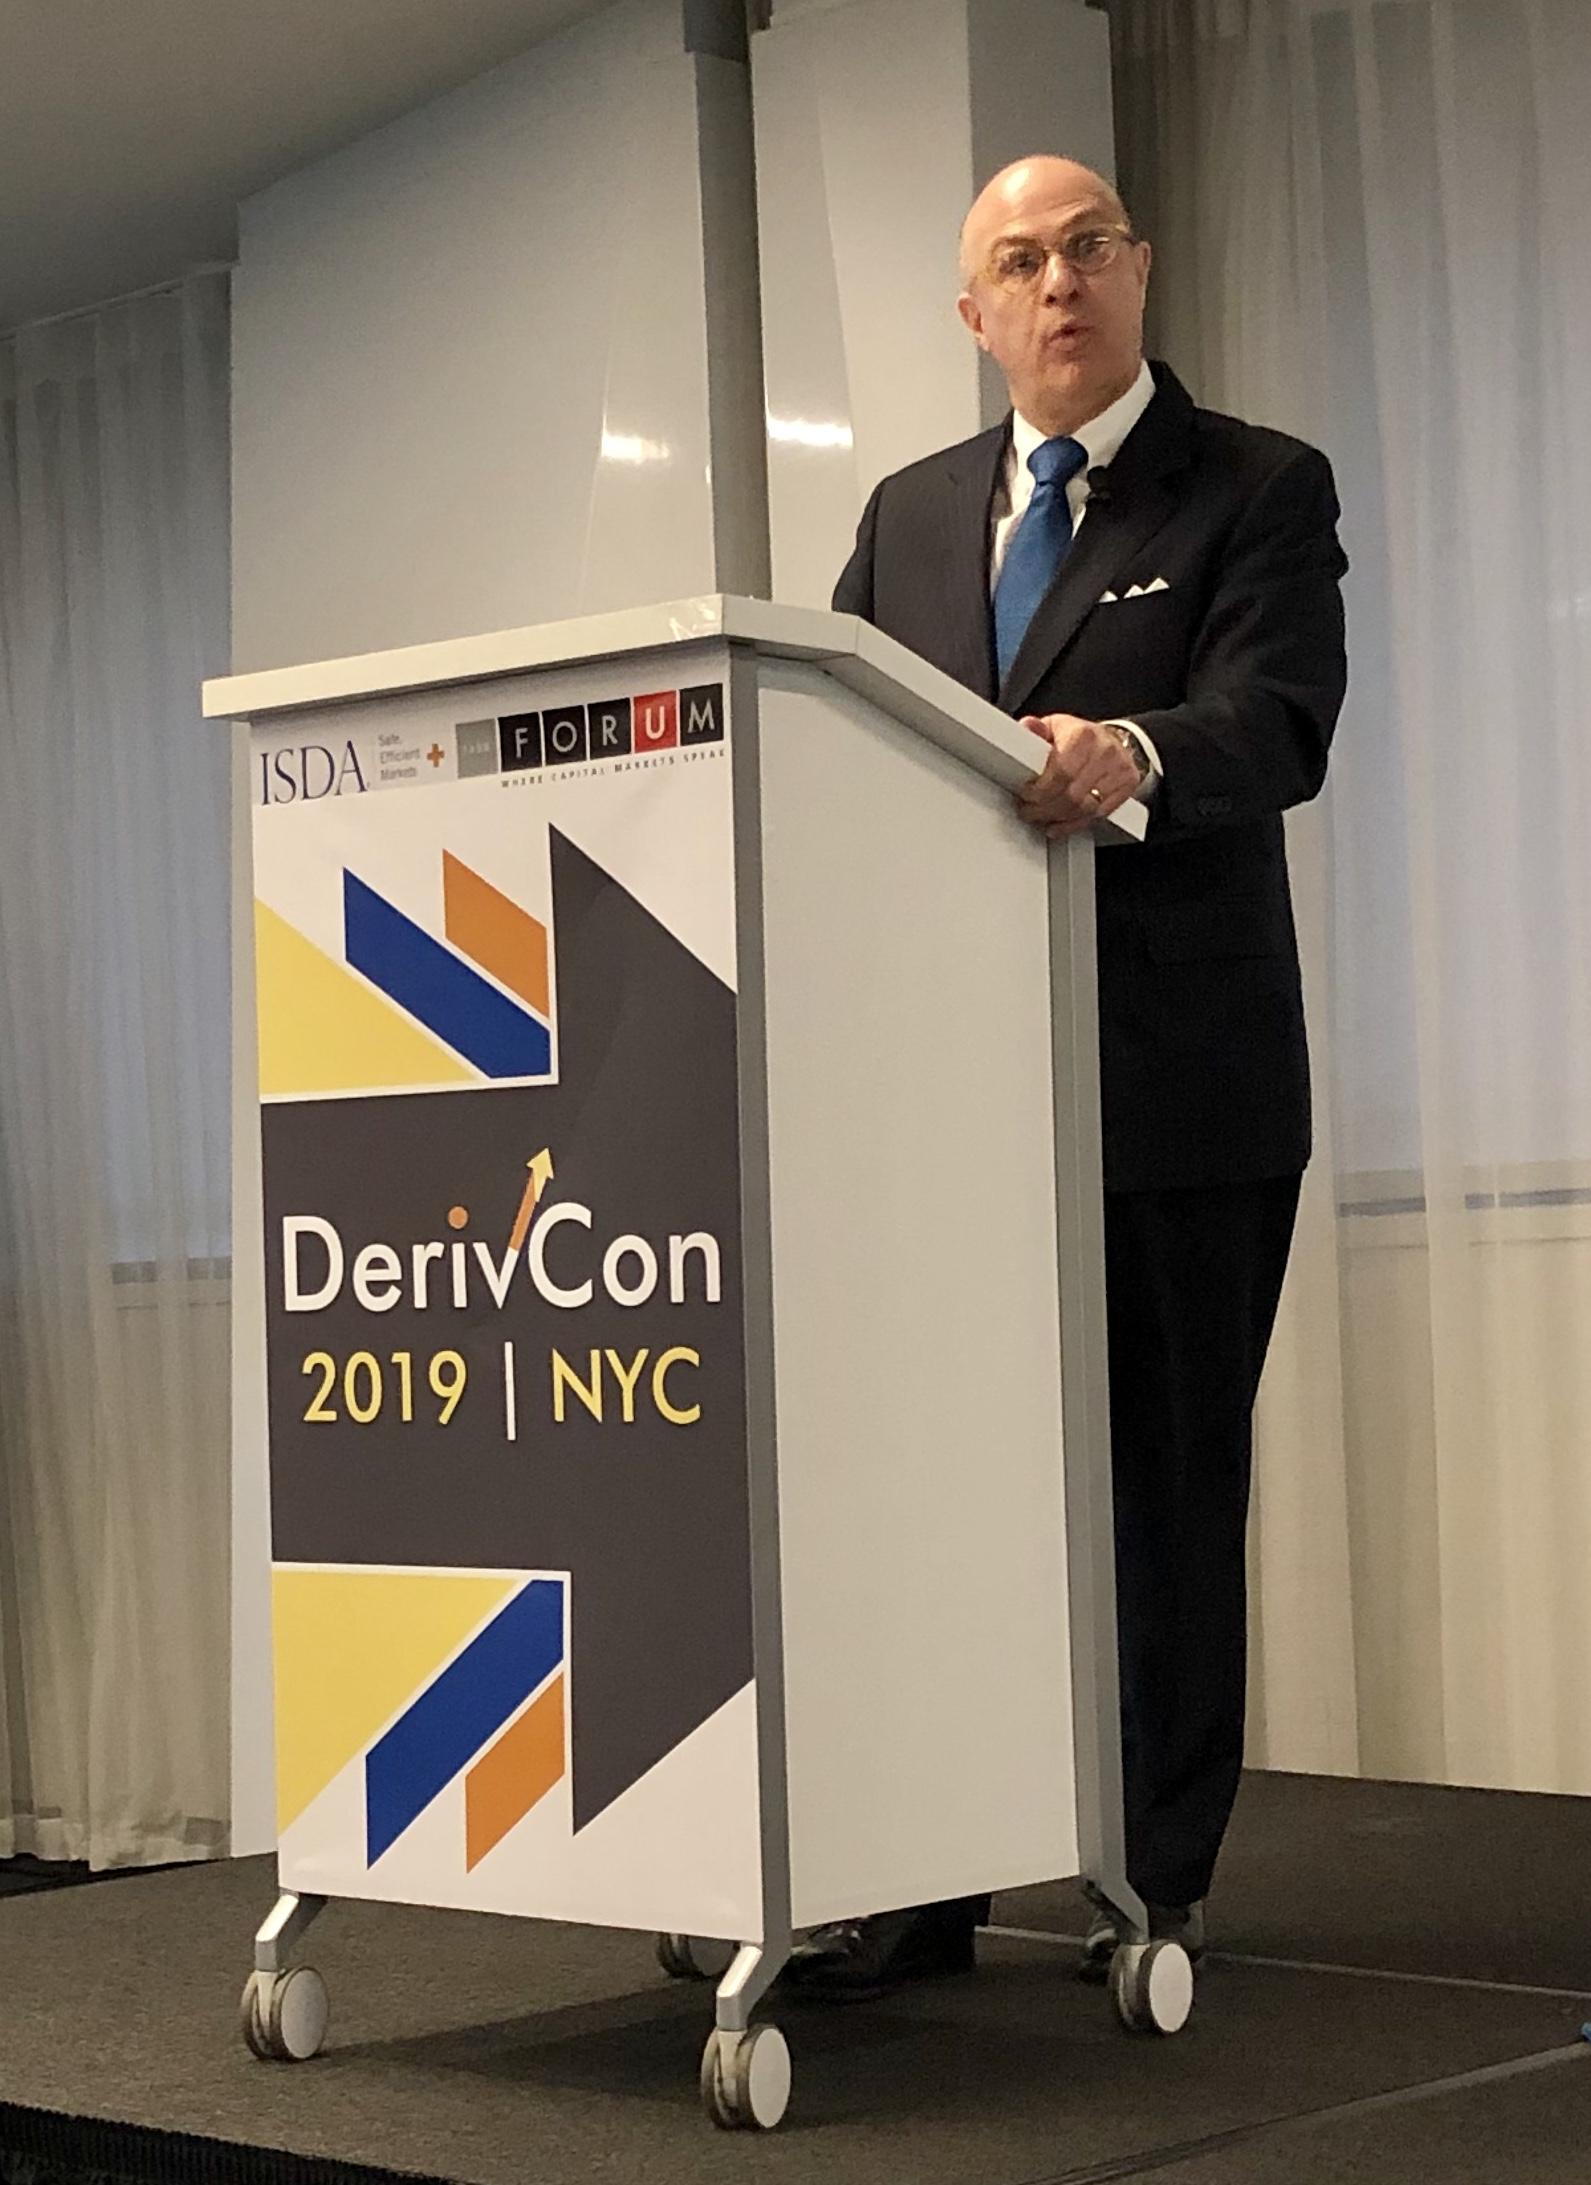 Derivcon-speaker.jpg